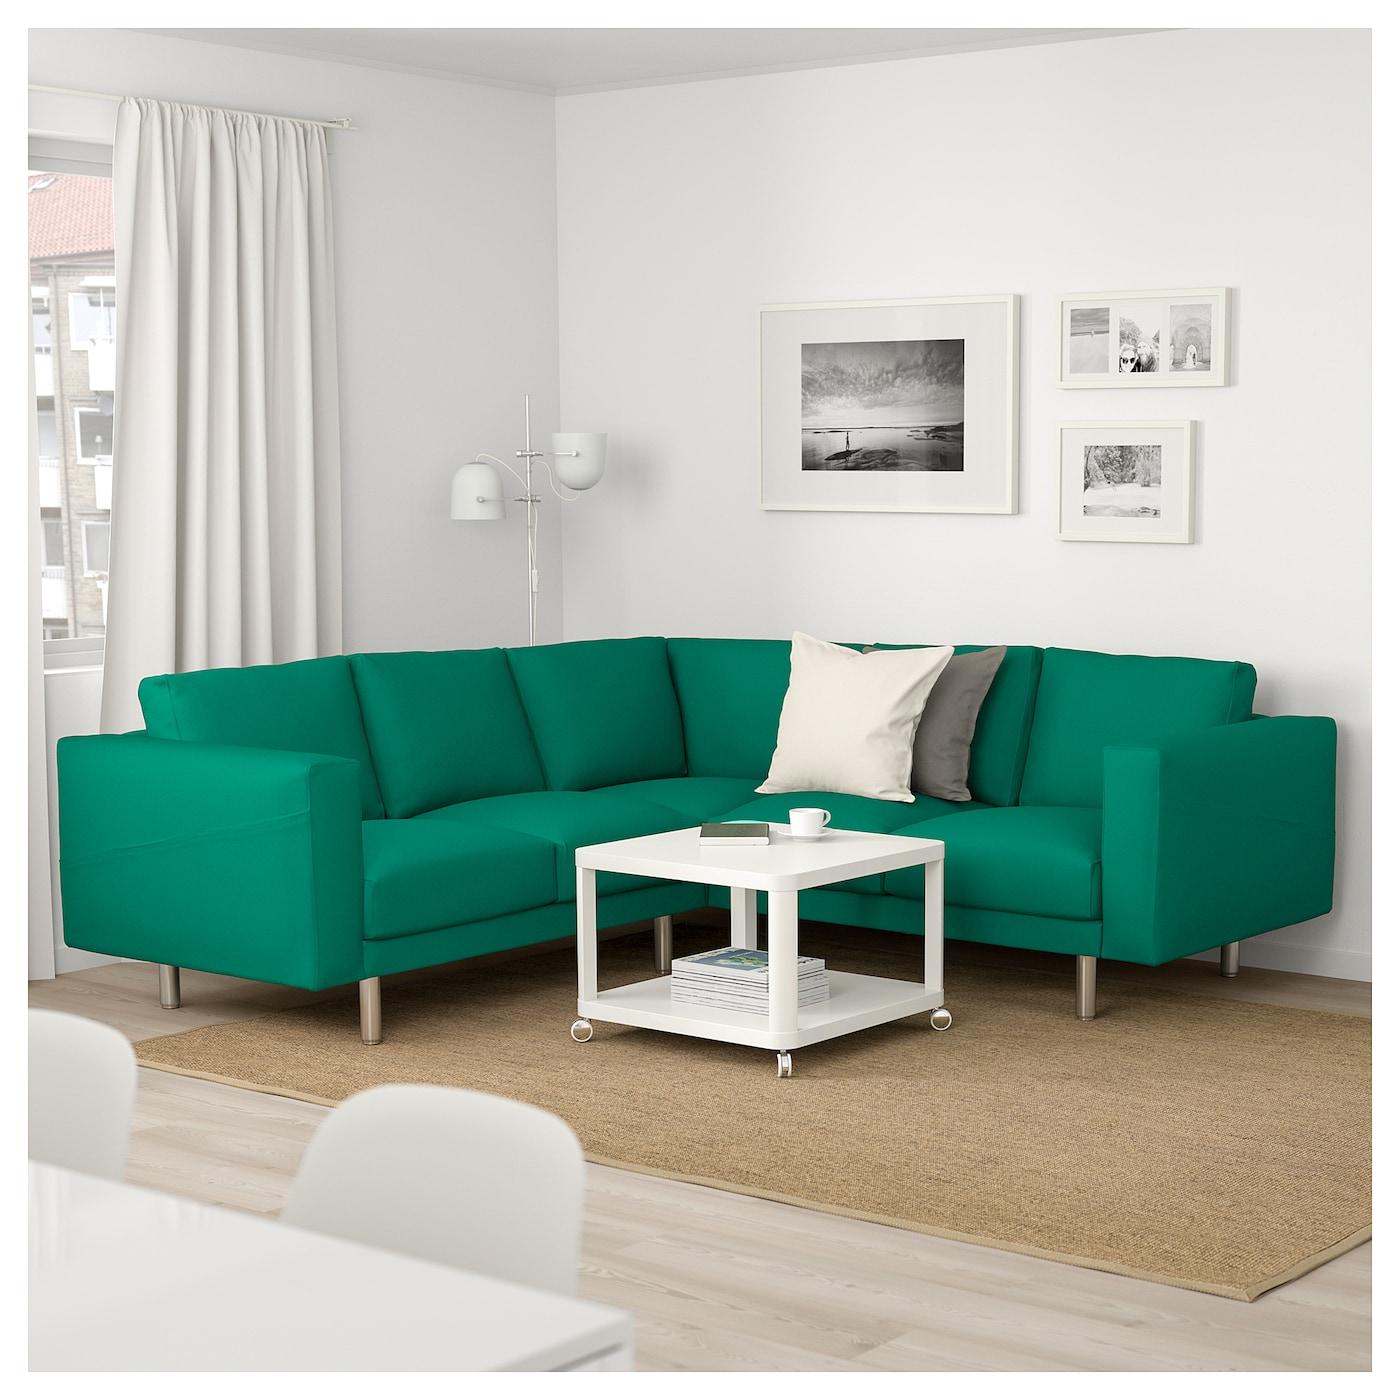 Norsborg corner sofa 4 seat grasbo bright green metal ikea for Amazing bright green sofa